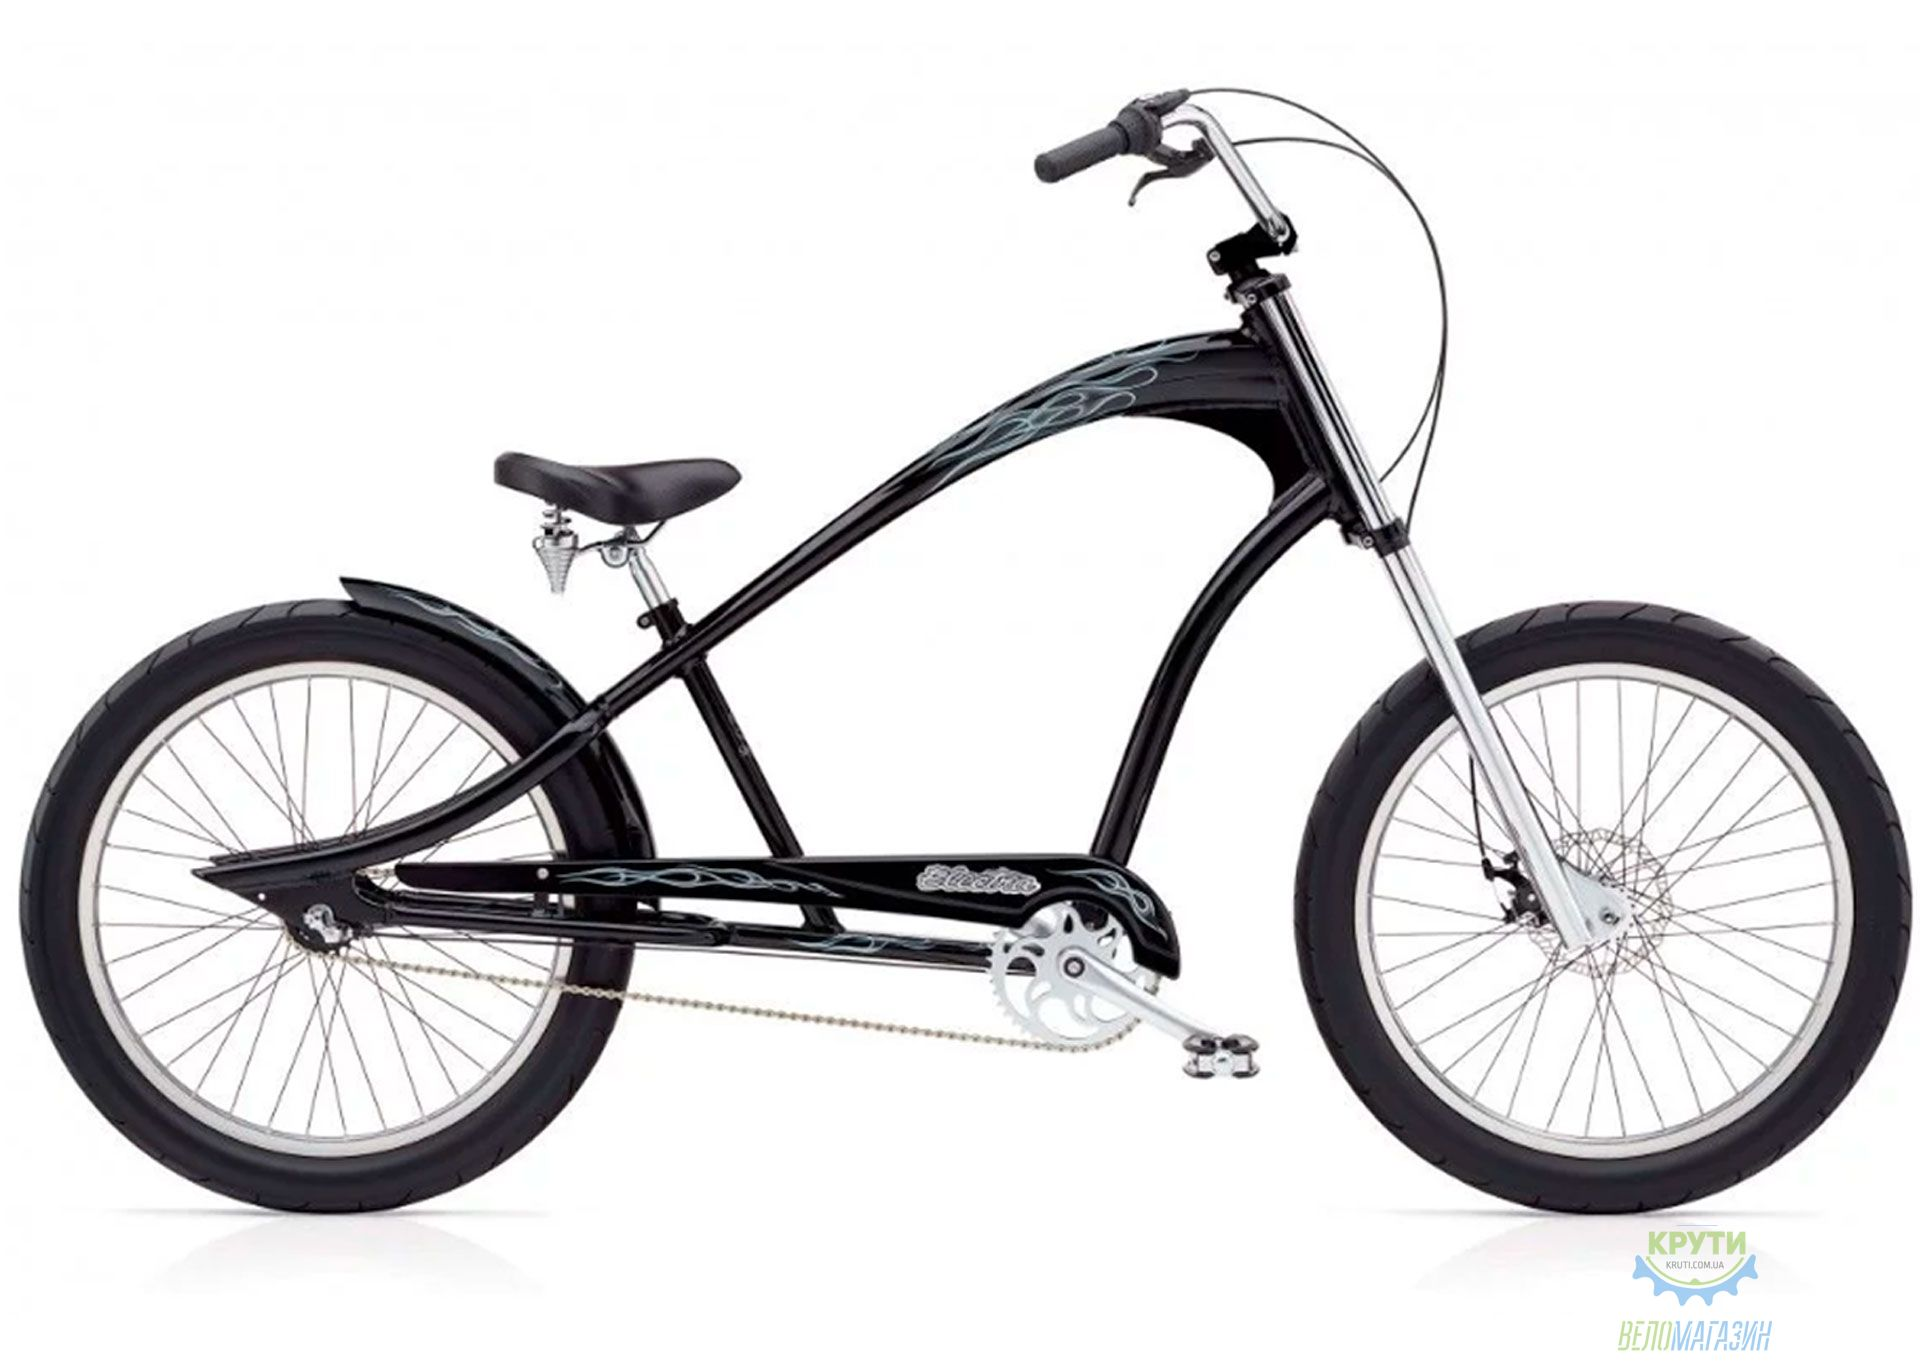 Велосипед 24 Electra Ghostrider 3i (Alloy) Men's Black